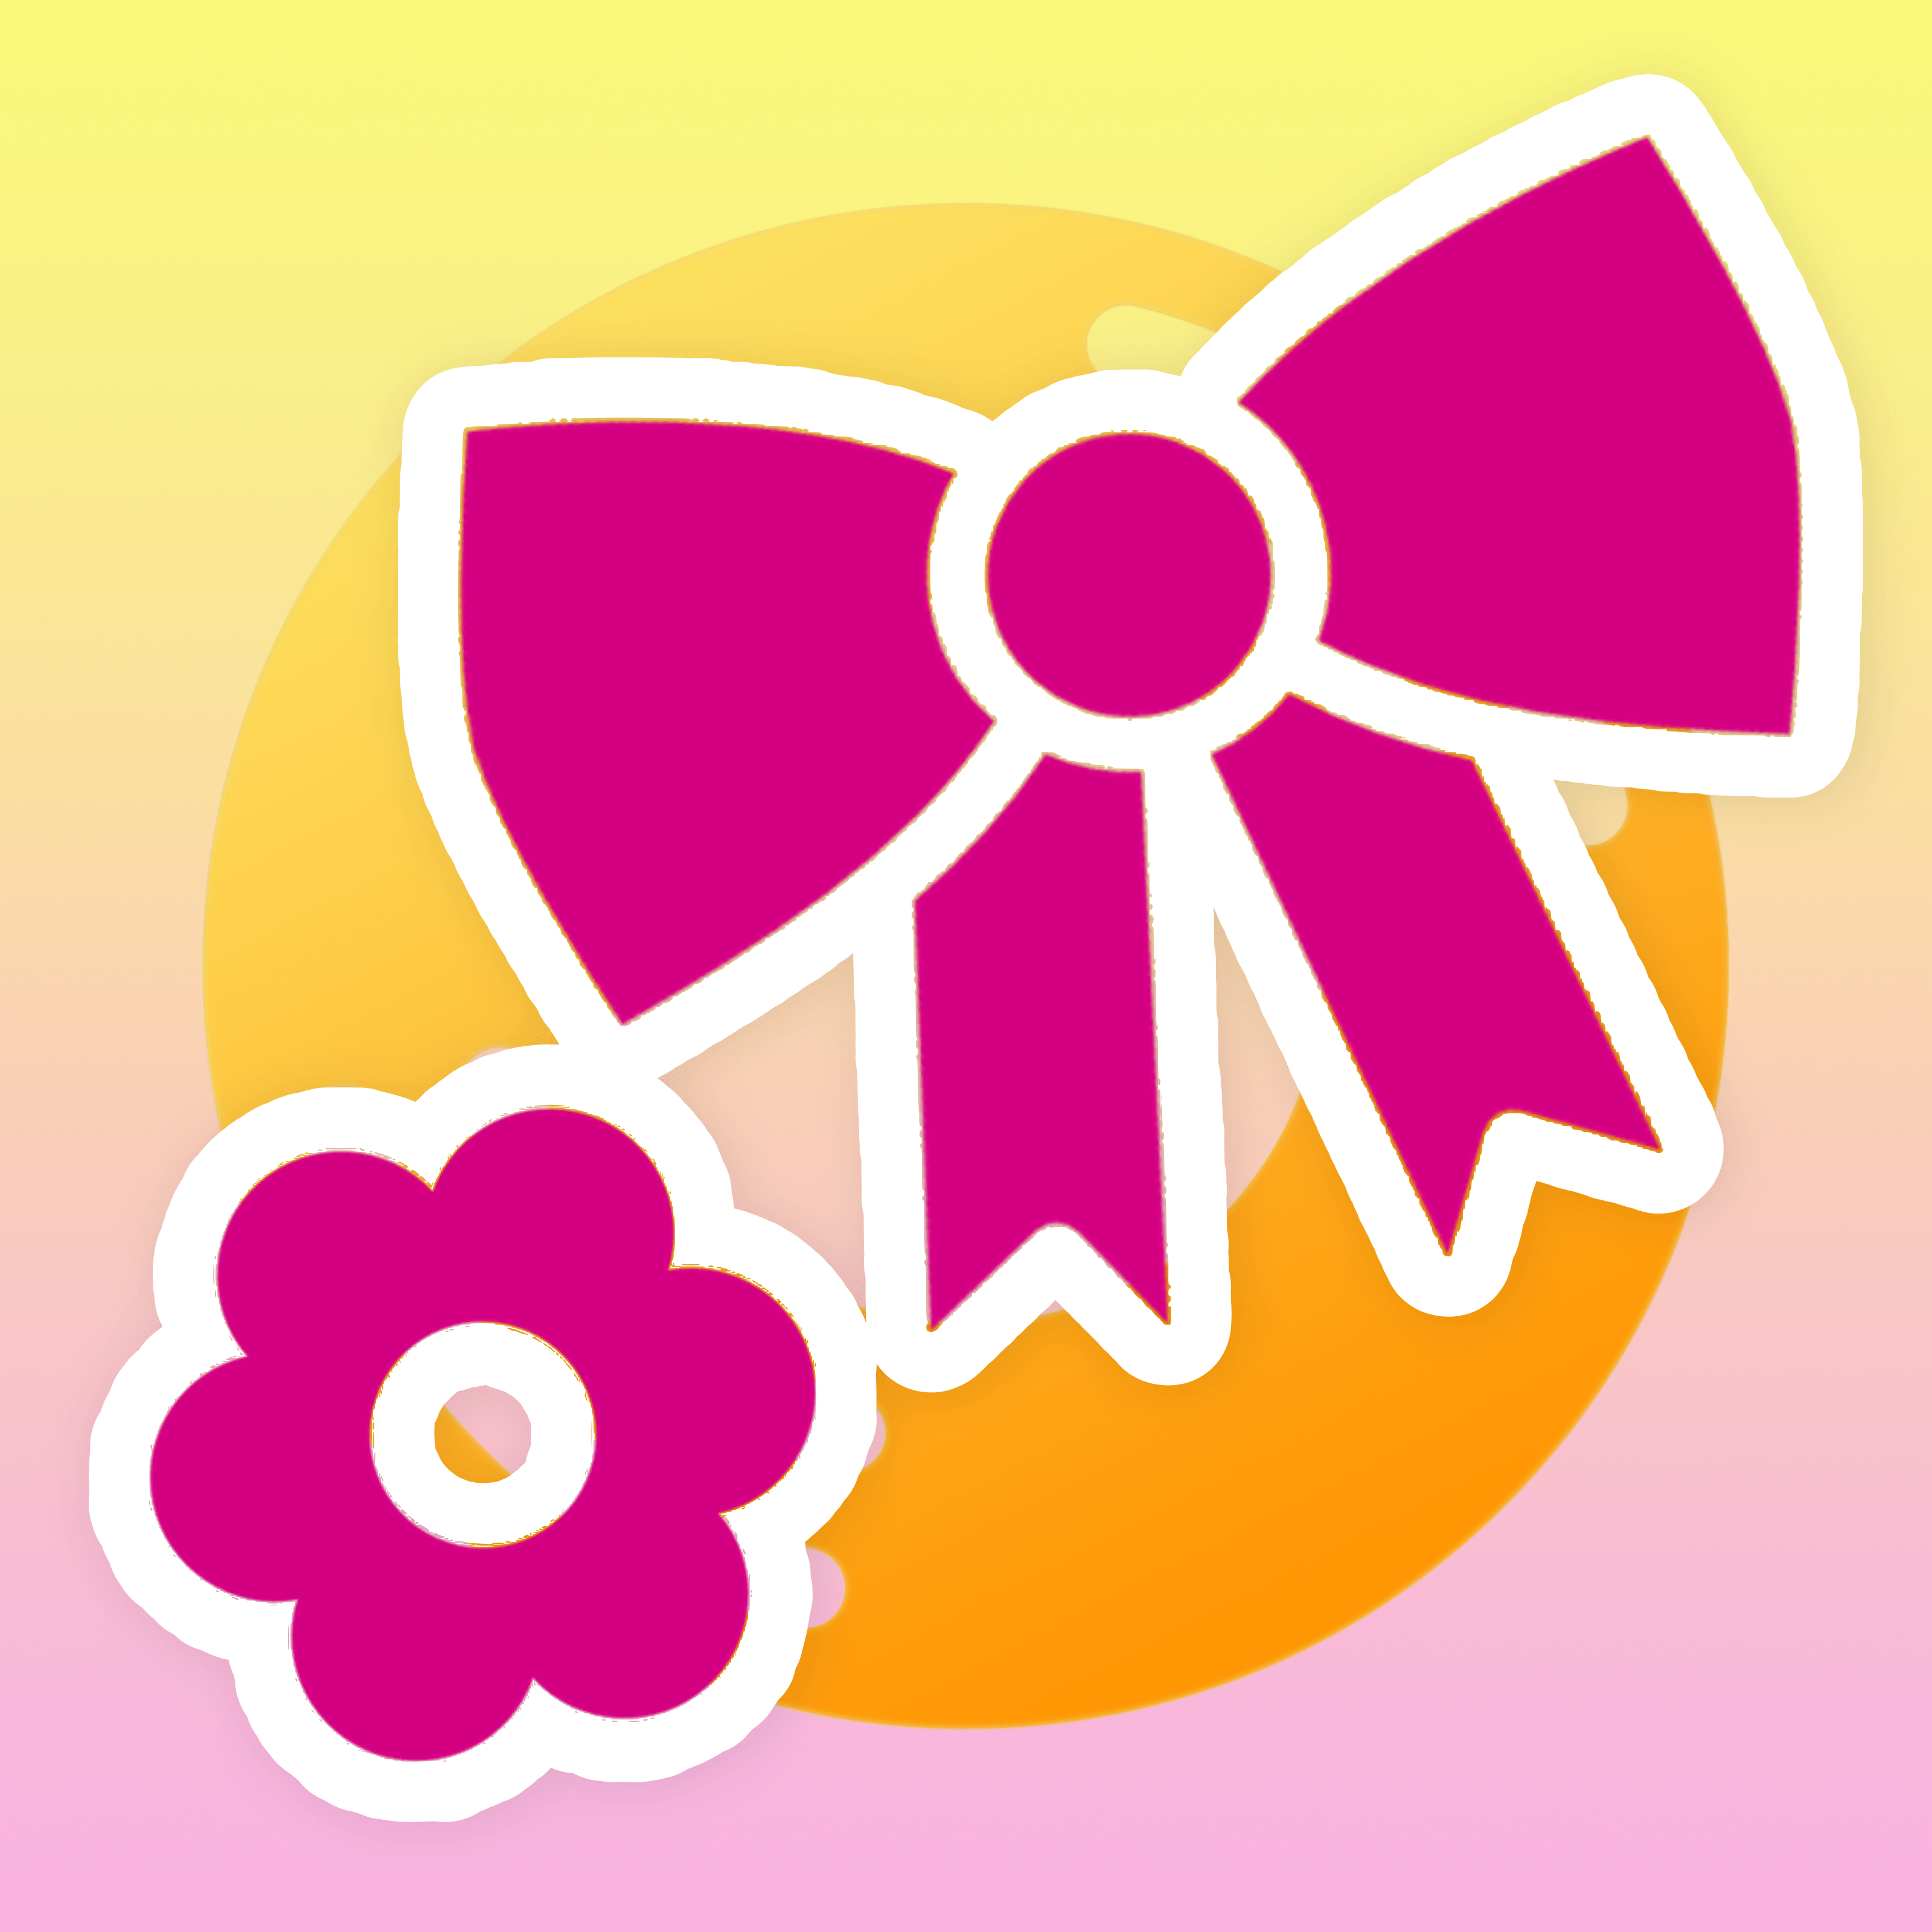 Obscur_Crystal avatar